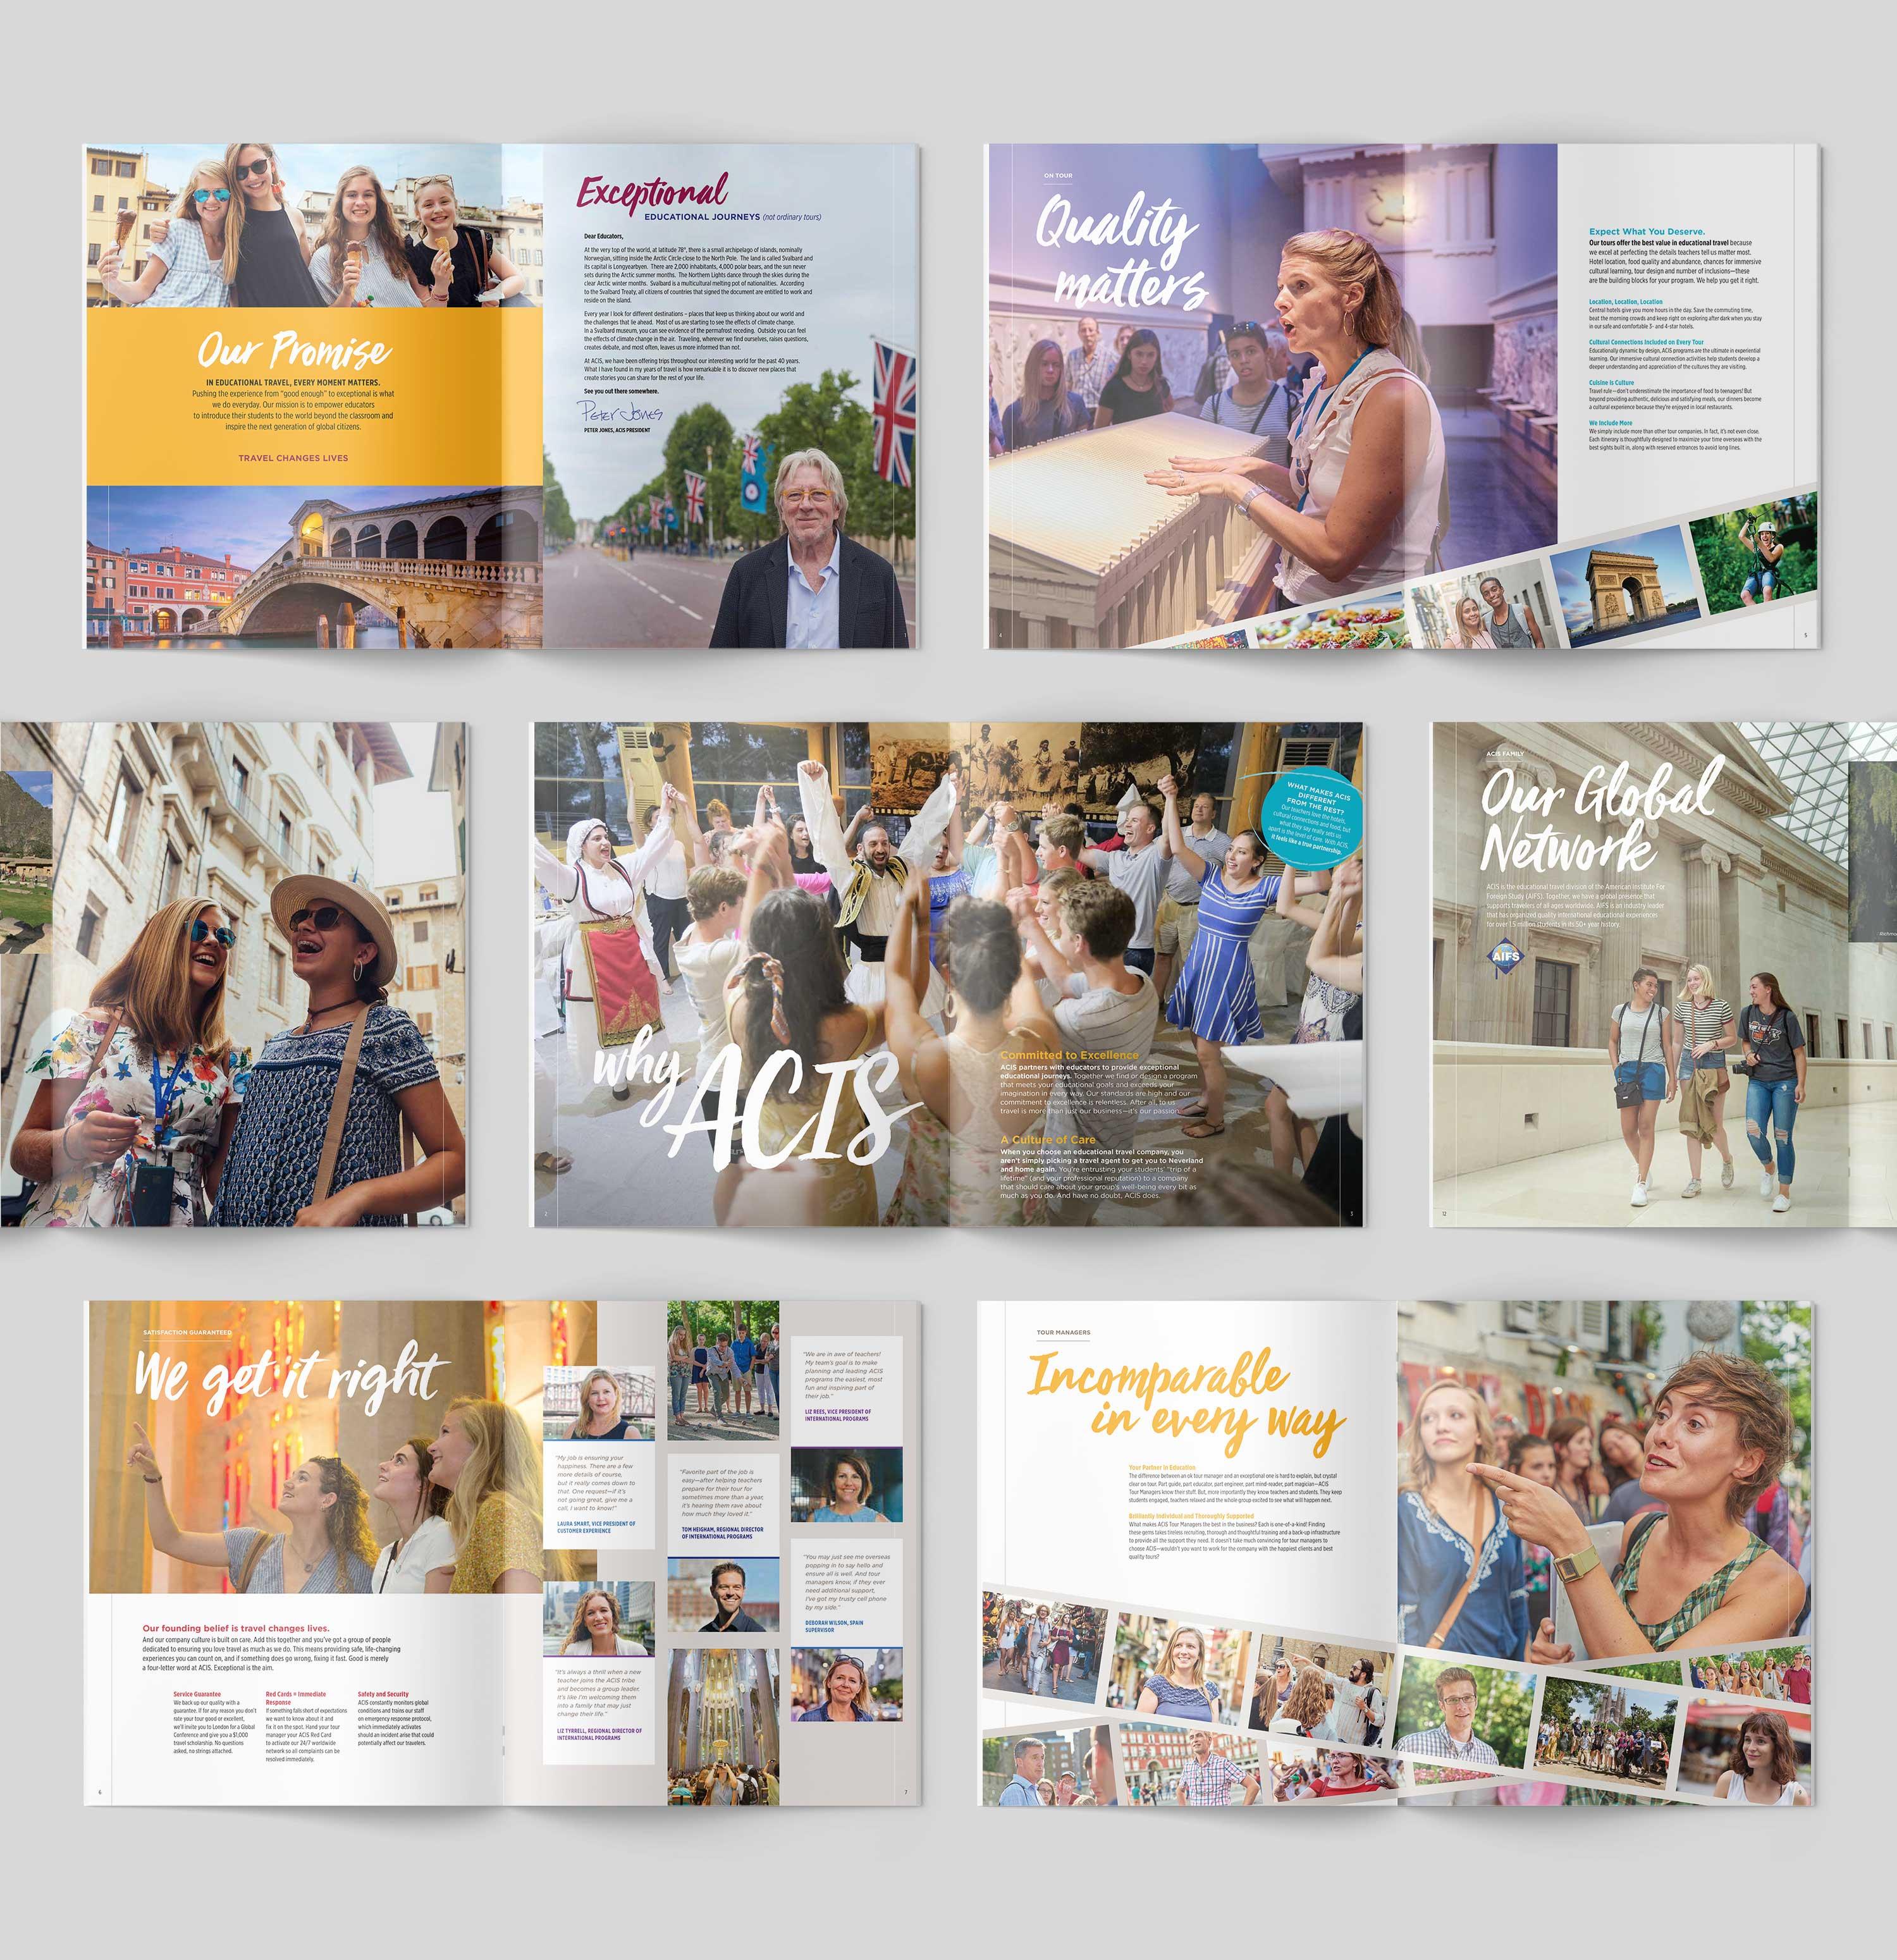 ACIS Catalog interior spreads on grey background